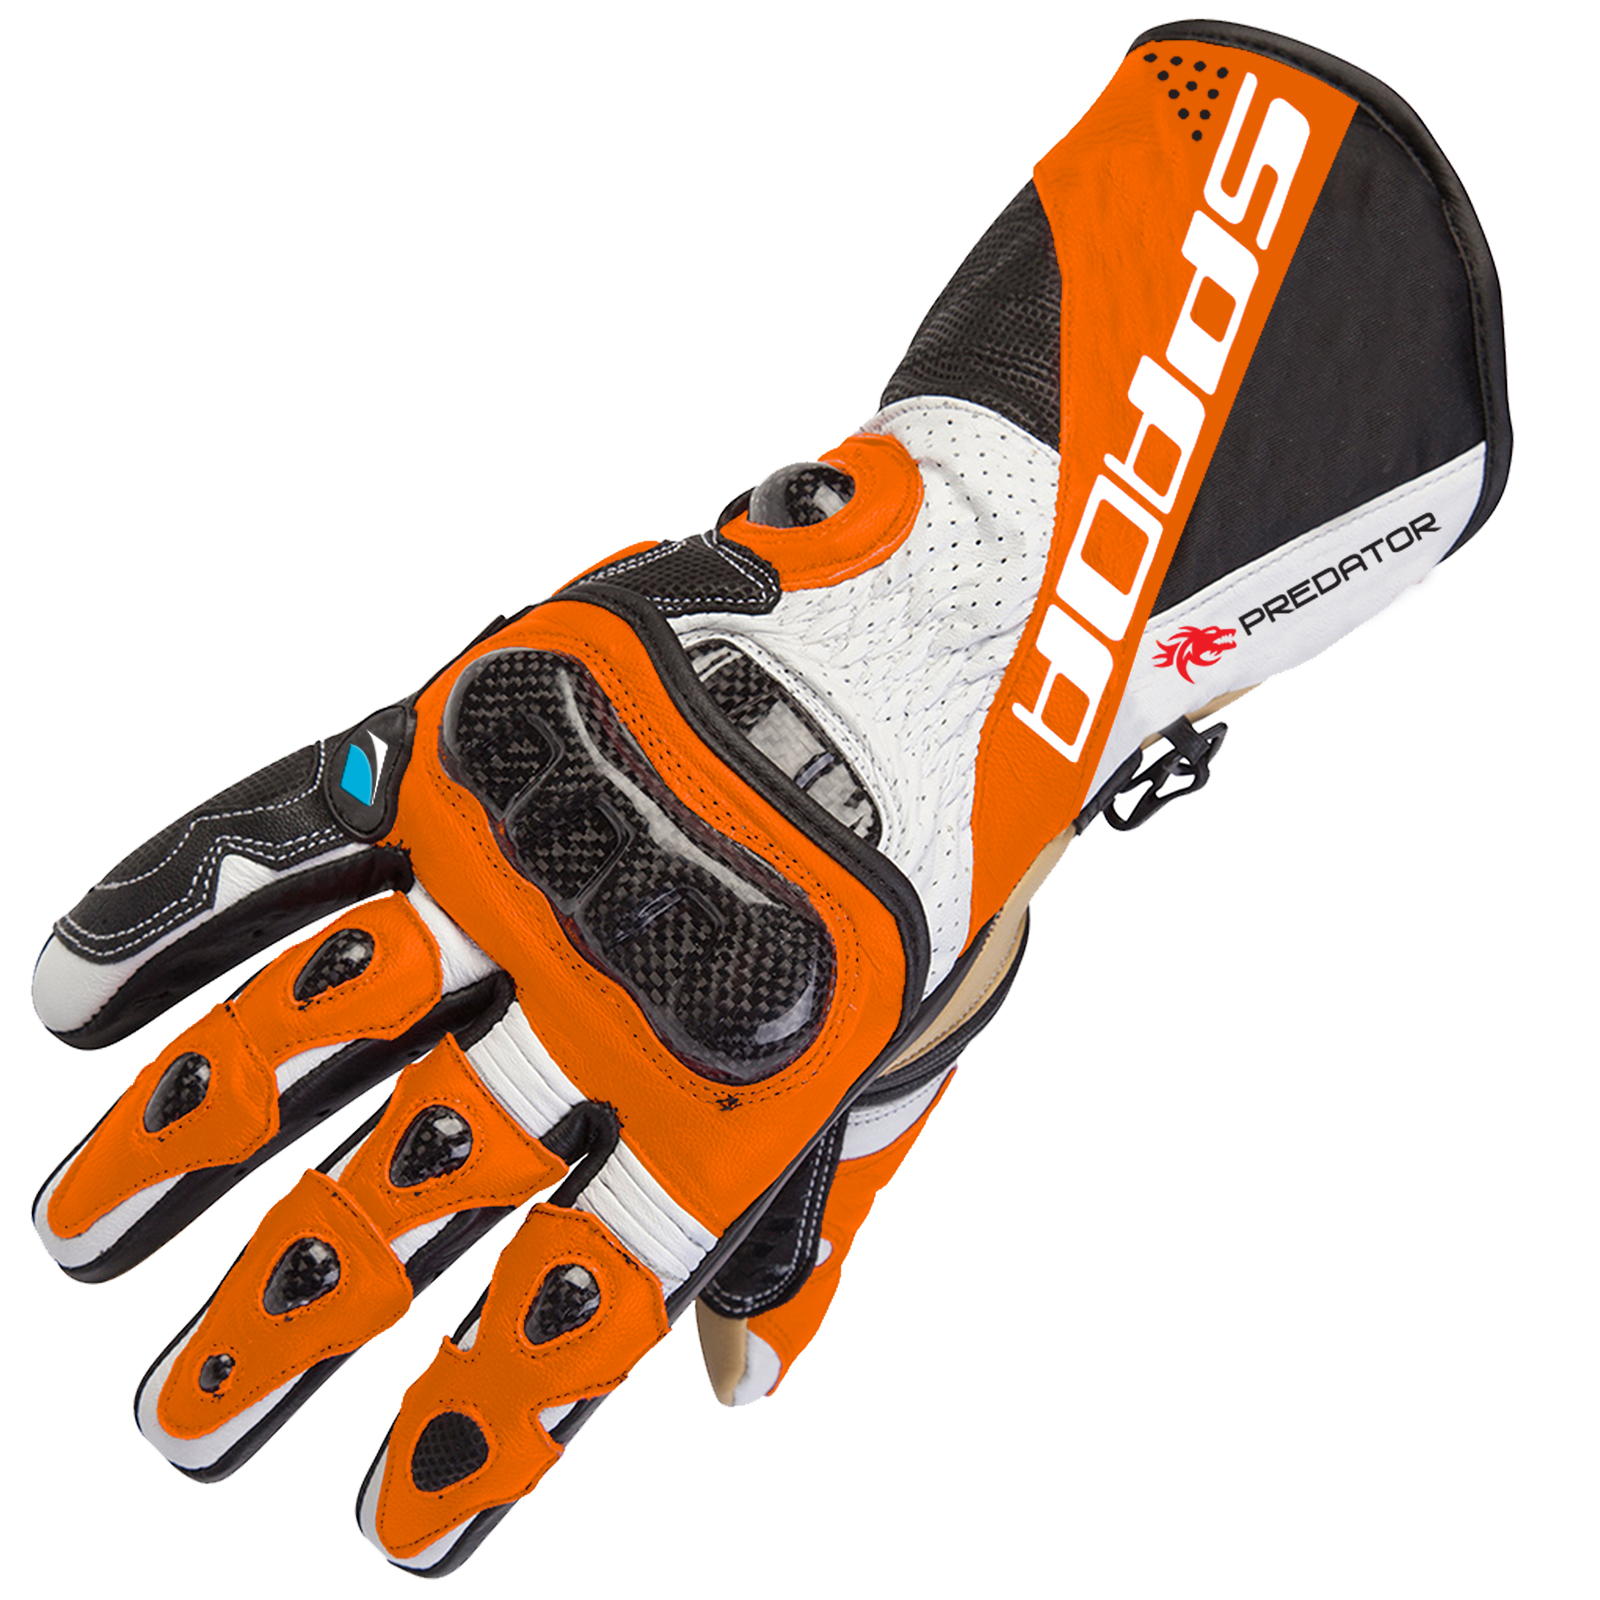 Motorcycle gloves for summer - Spada Predator 2 Leather Motorcycle Gloves Motorbike Race